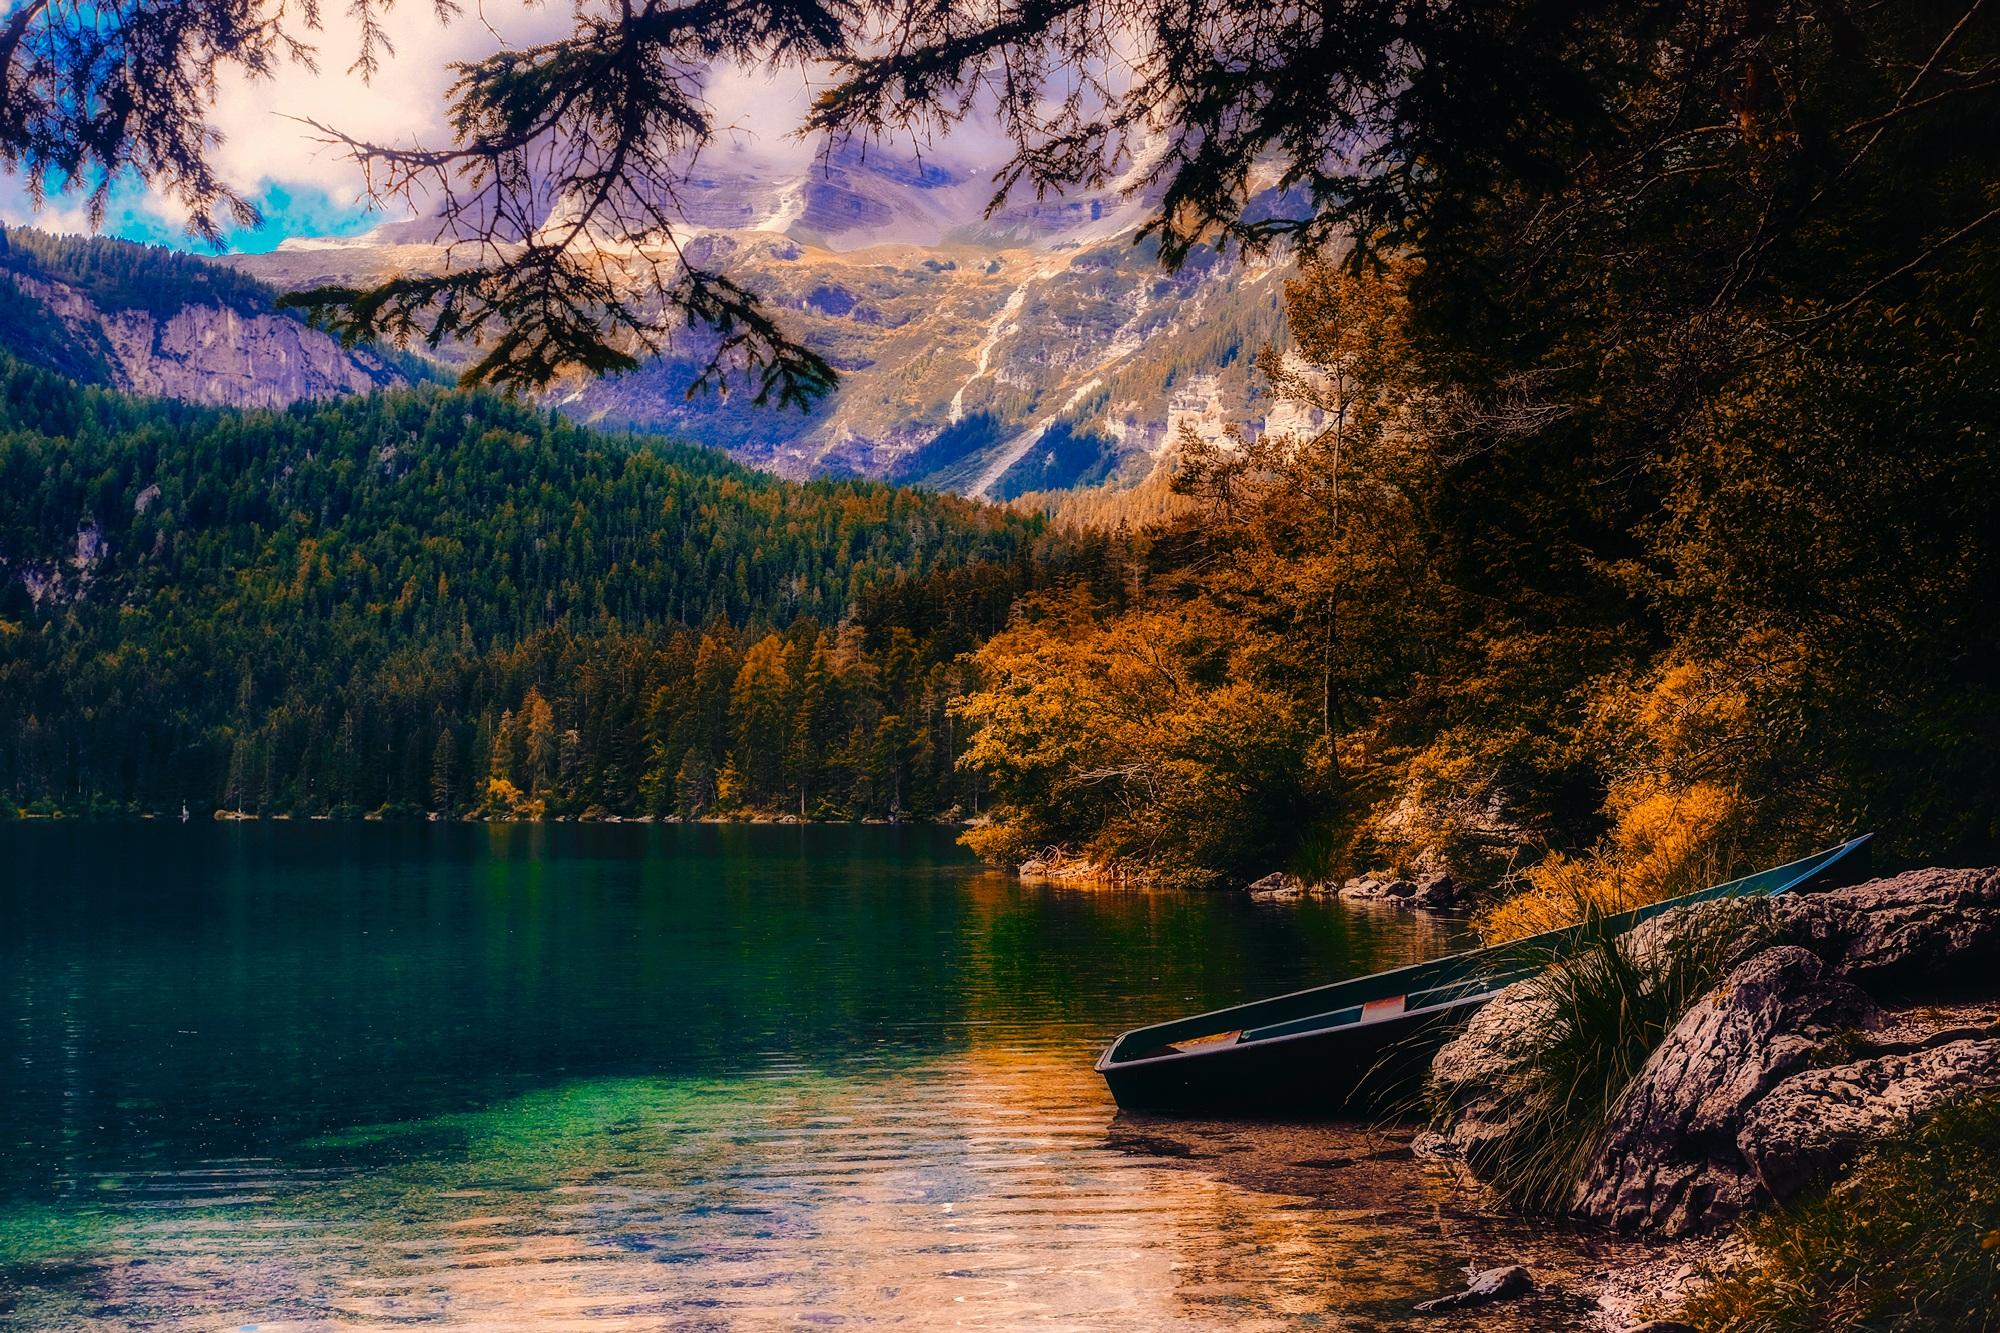 Hd Wallpapers City Nature Fall Free Stock Photo Of Autumn Beautiful Boat